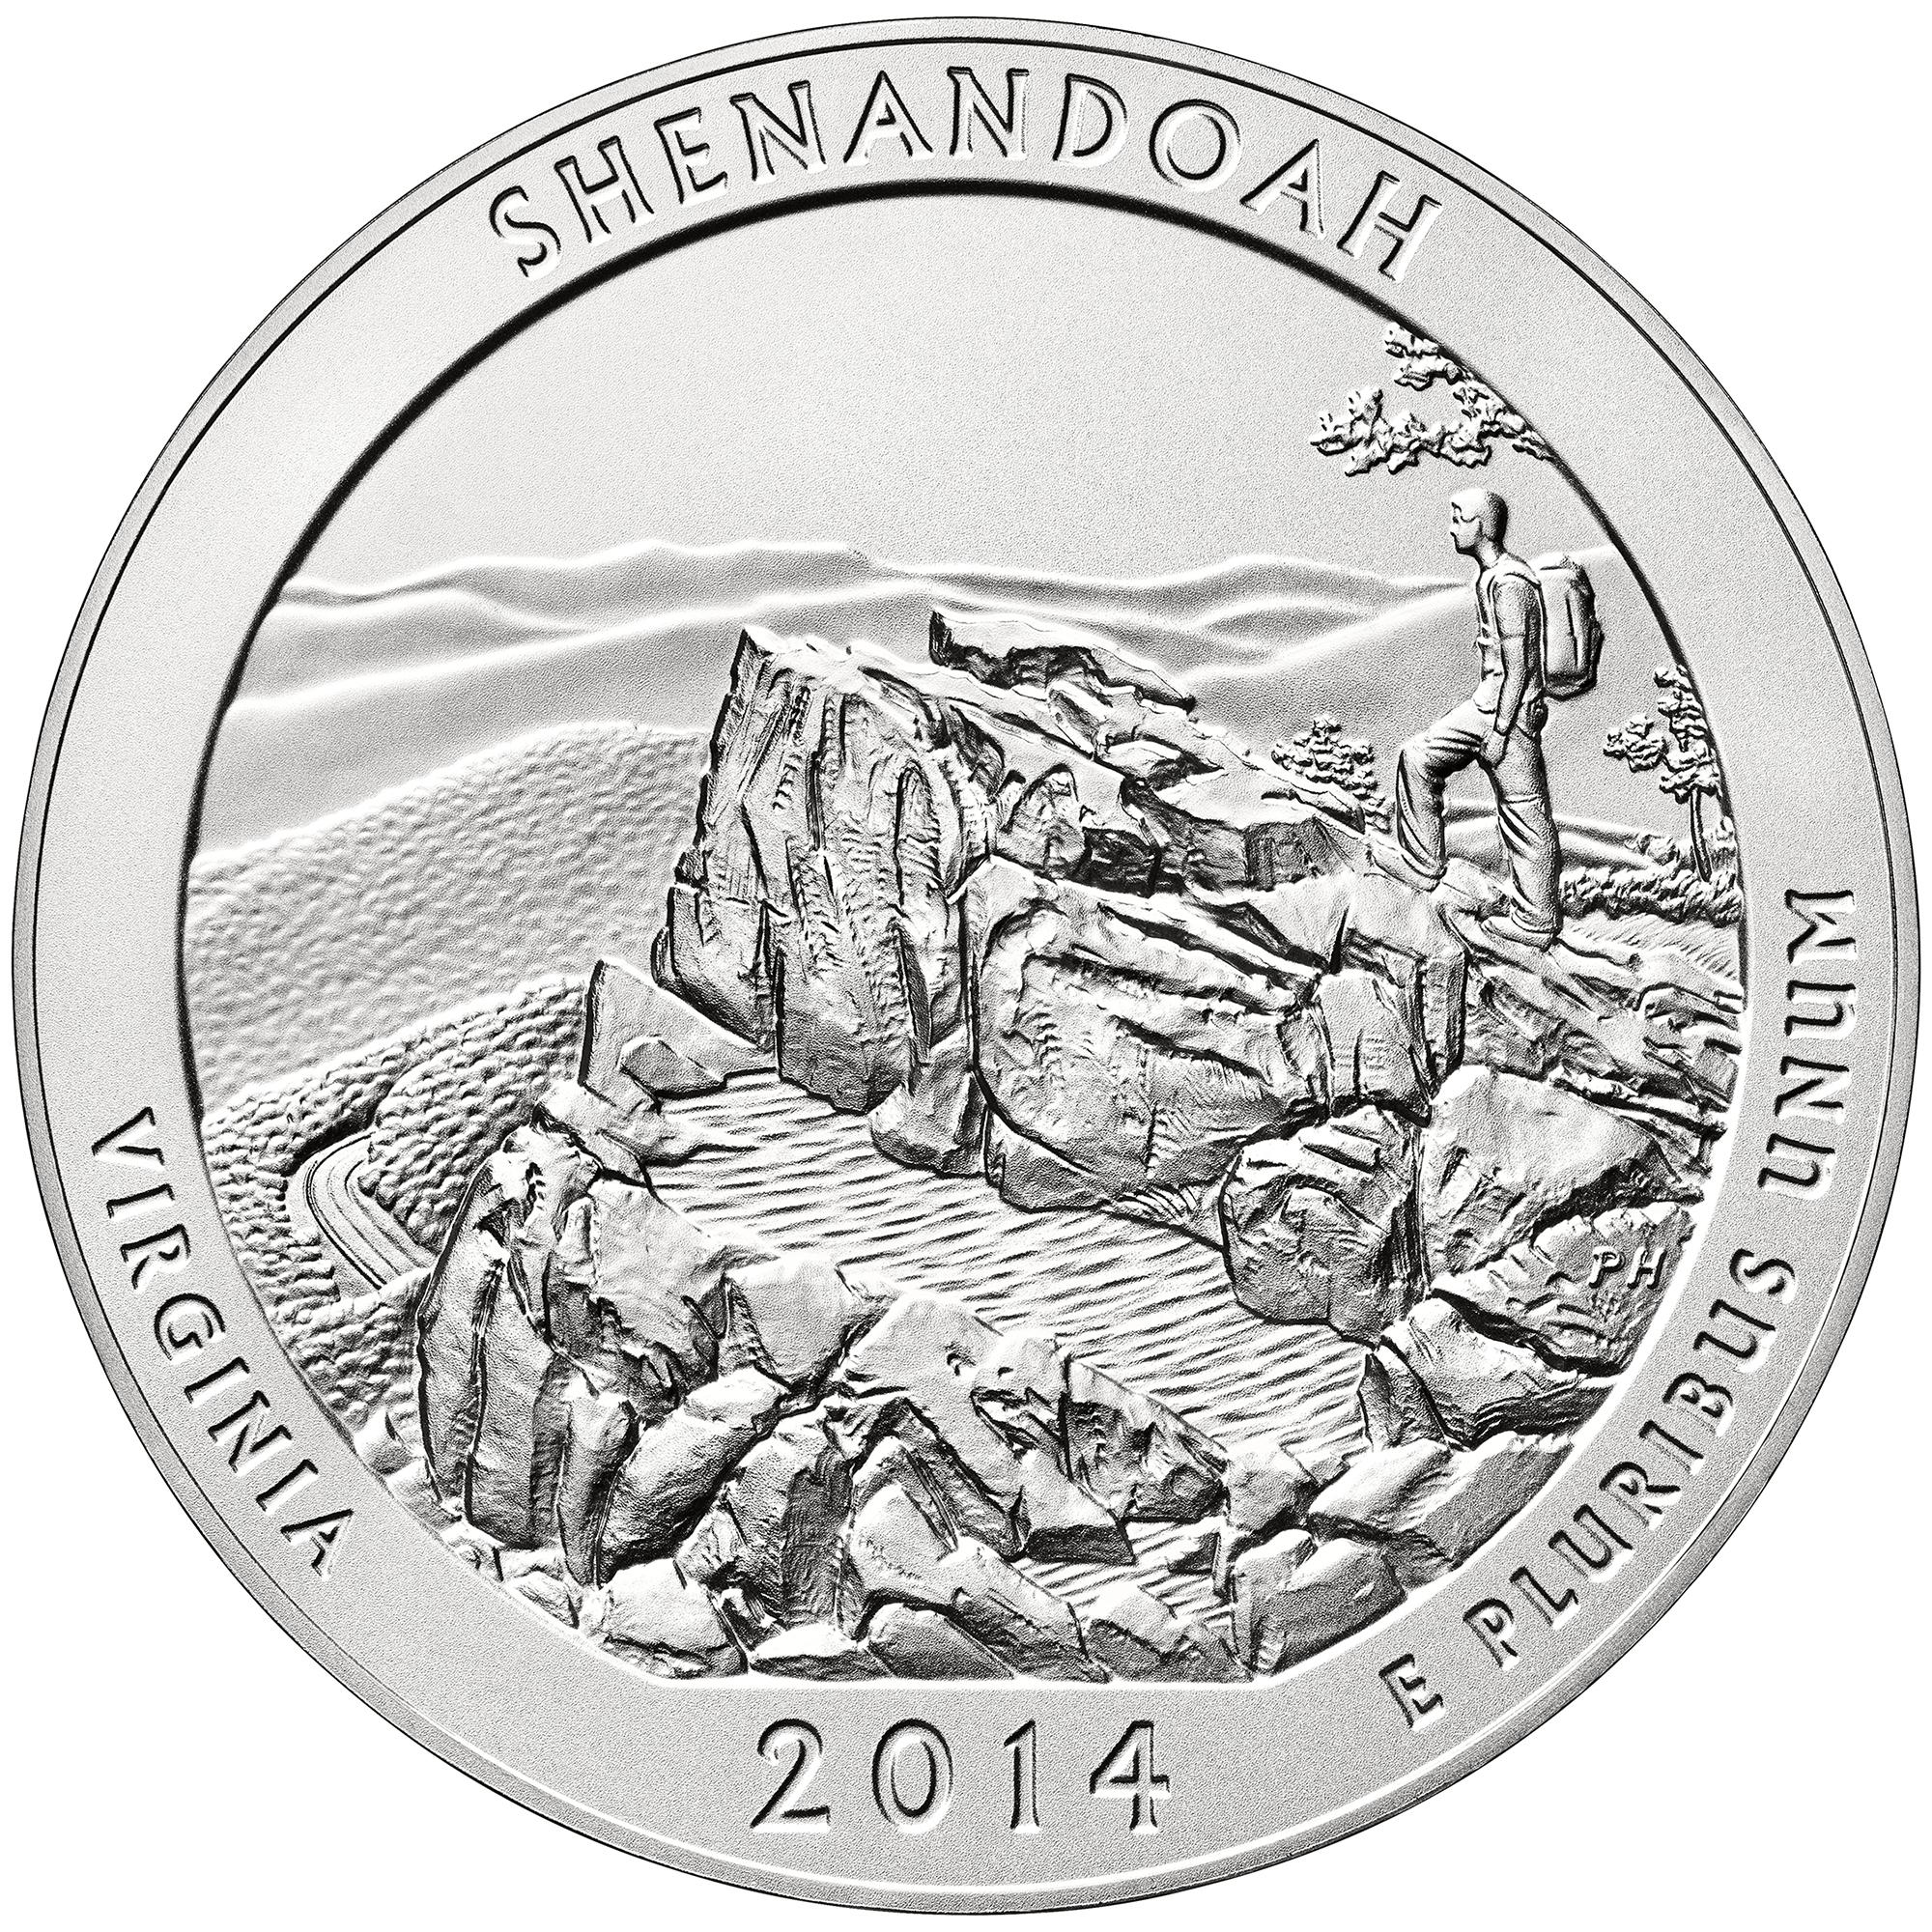 2014 America The Beautiful Quarters Five Ounce Silver Uncirculated Coin Shenandoah Virginia Reverse